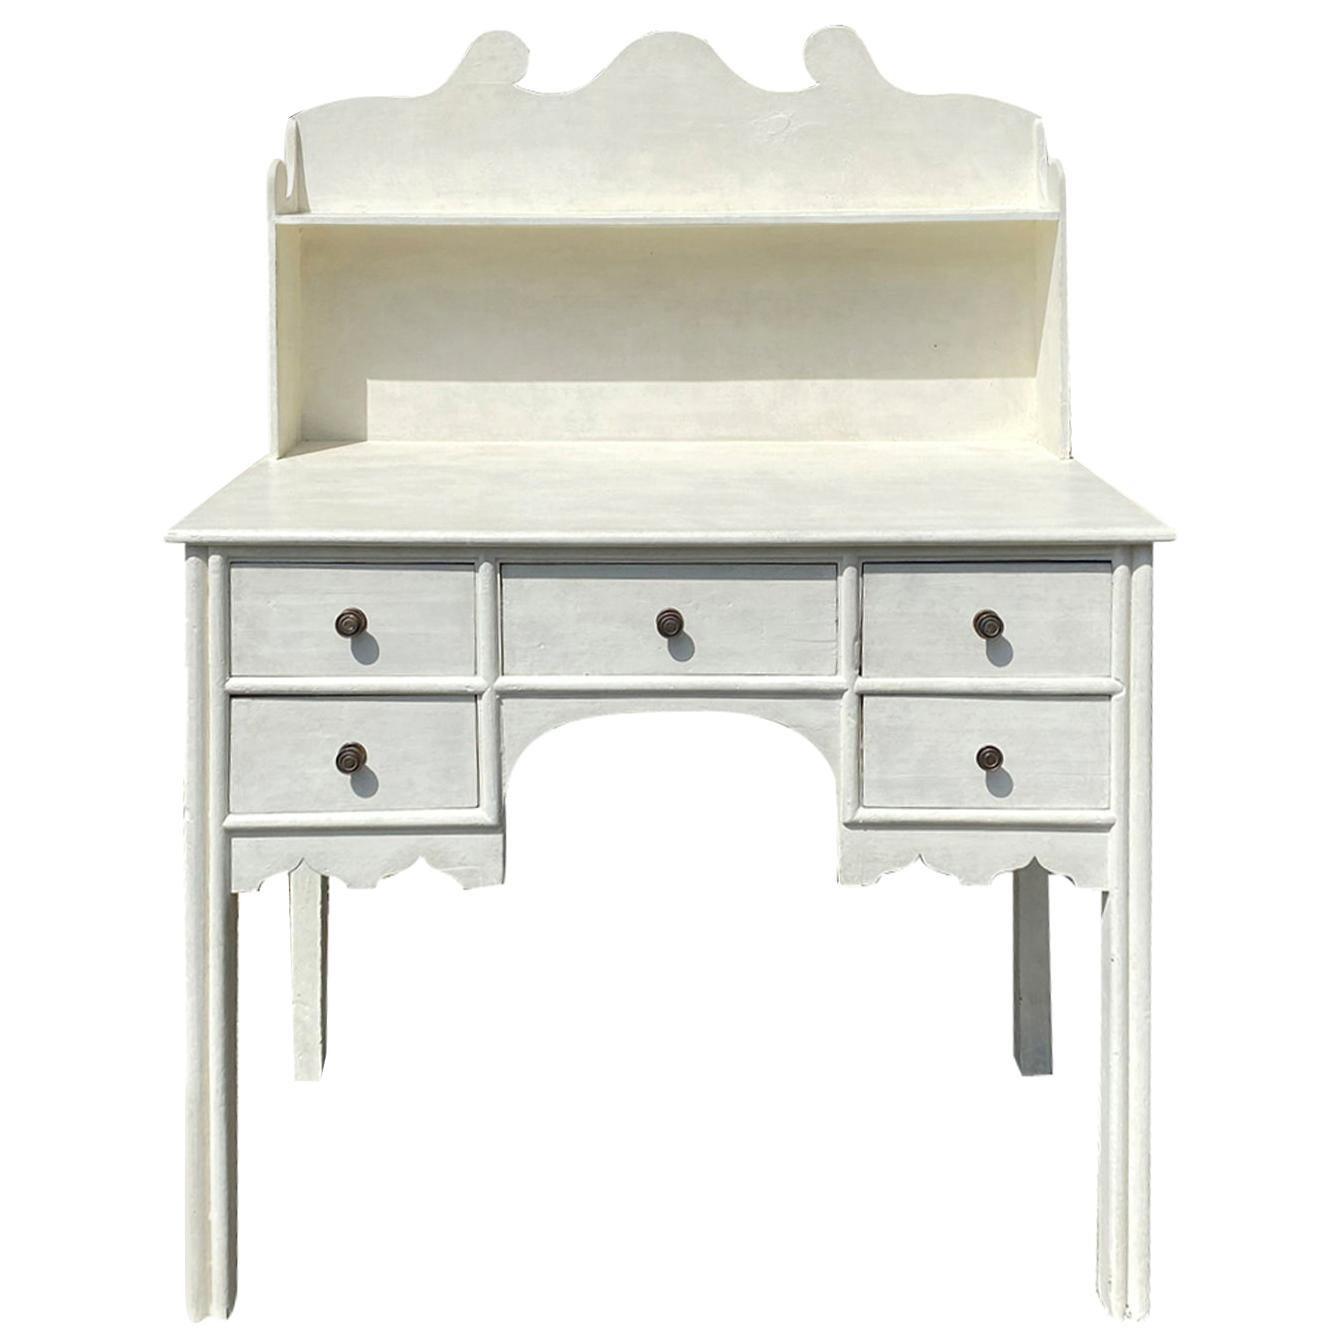 19th Century English Regency Style Painted Desk with Custom Finish